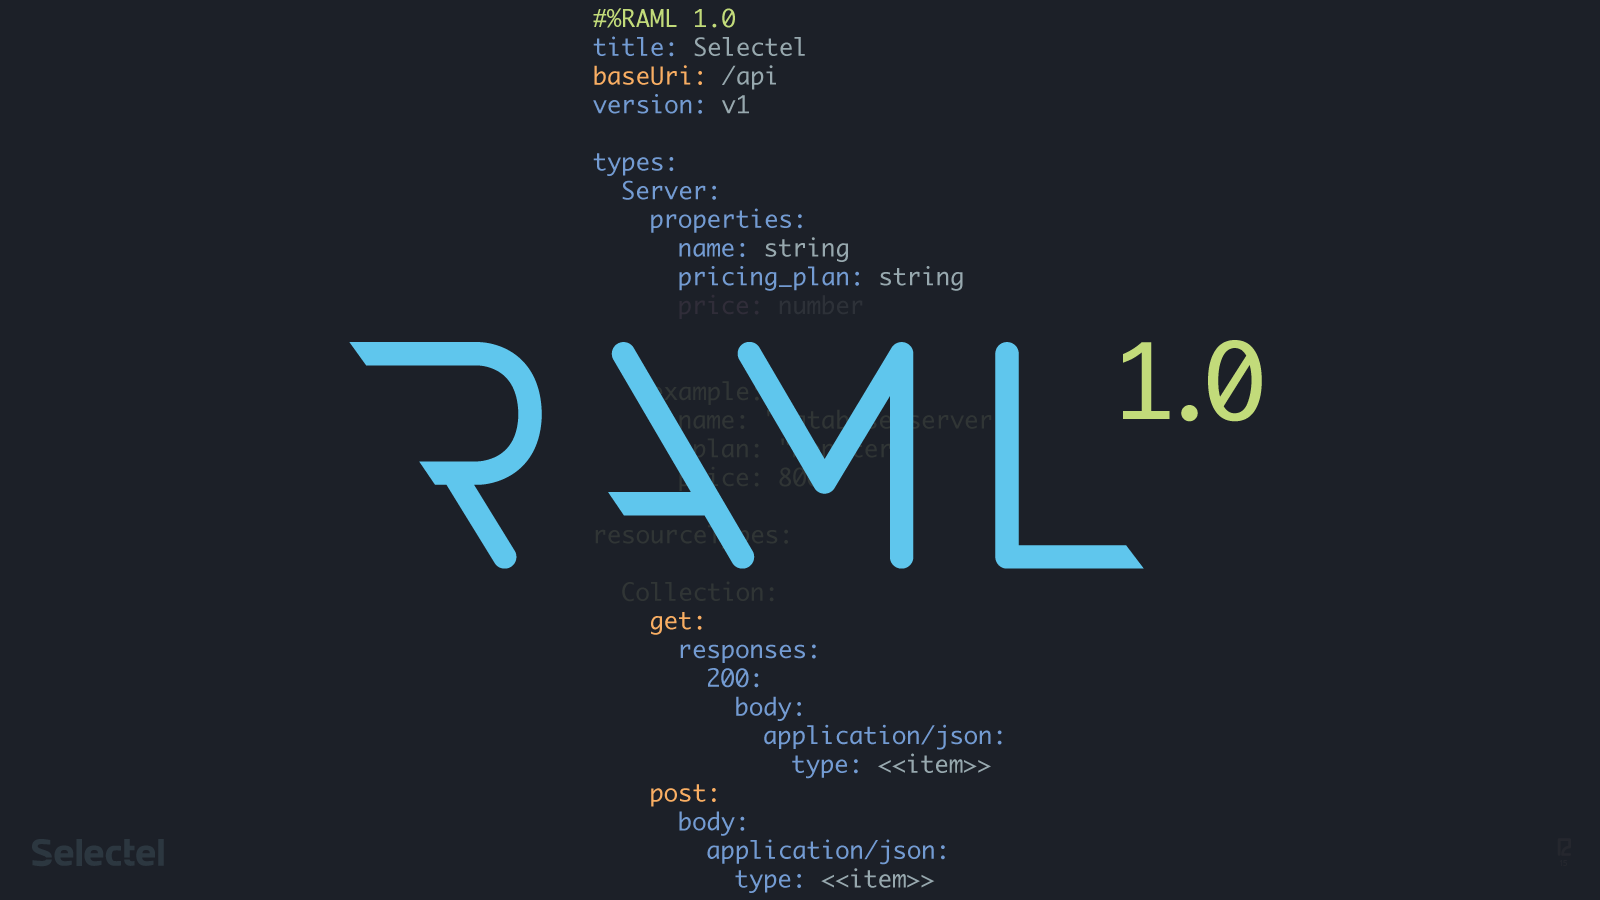 RAML 1.0